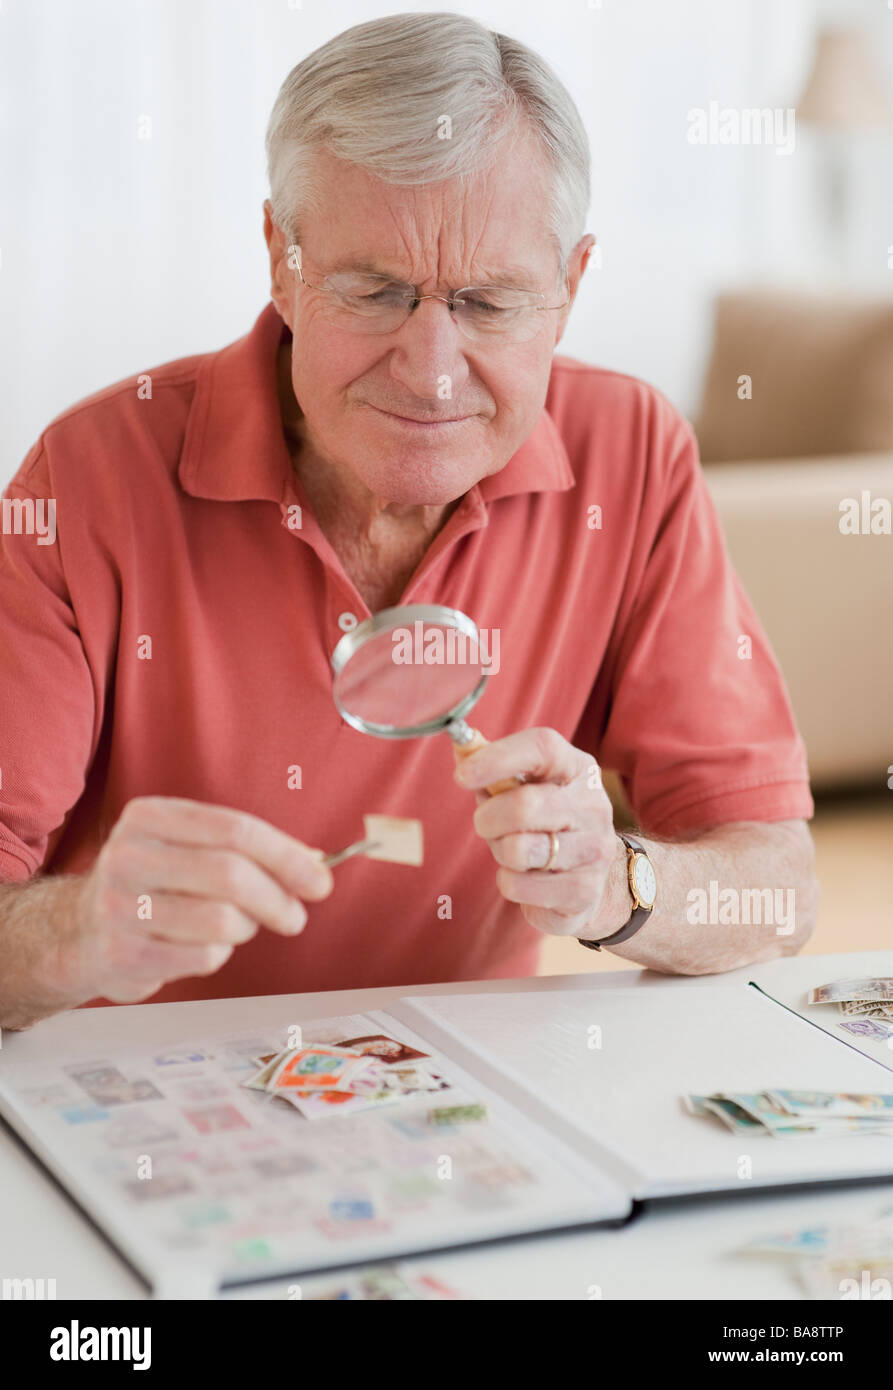 senior-man-looking-at-stamp-collection-B